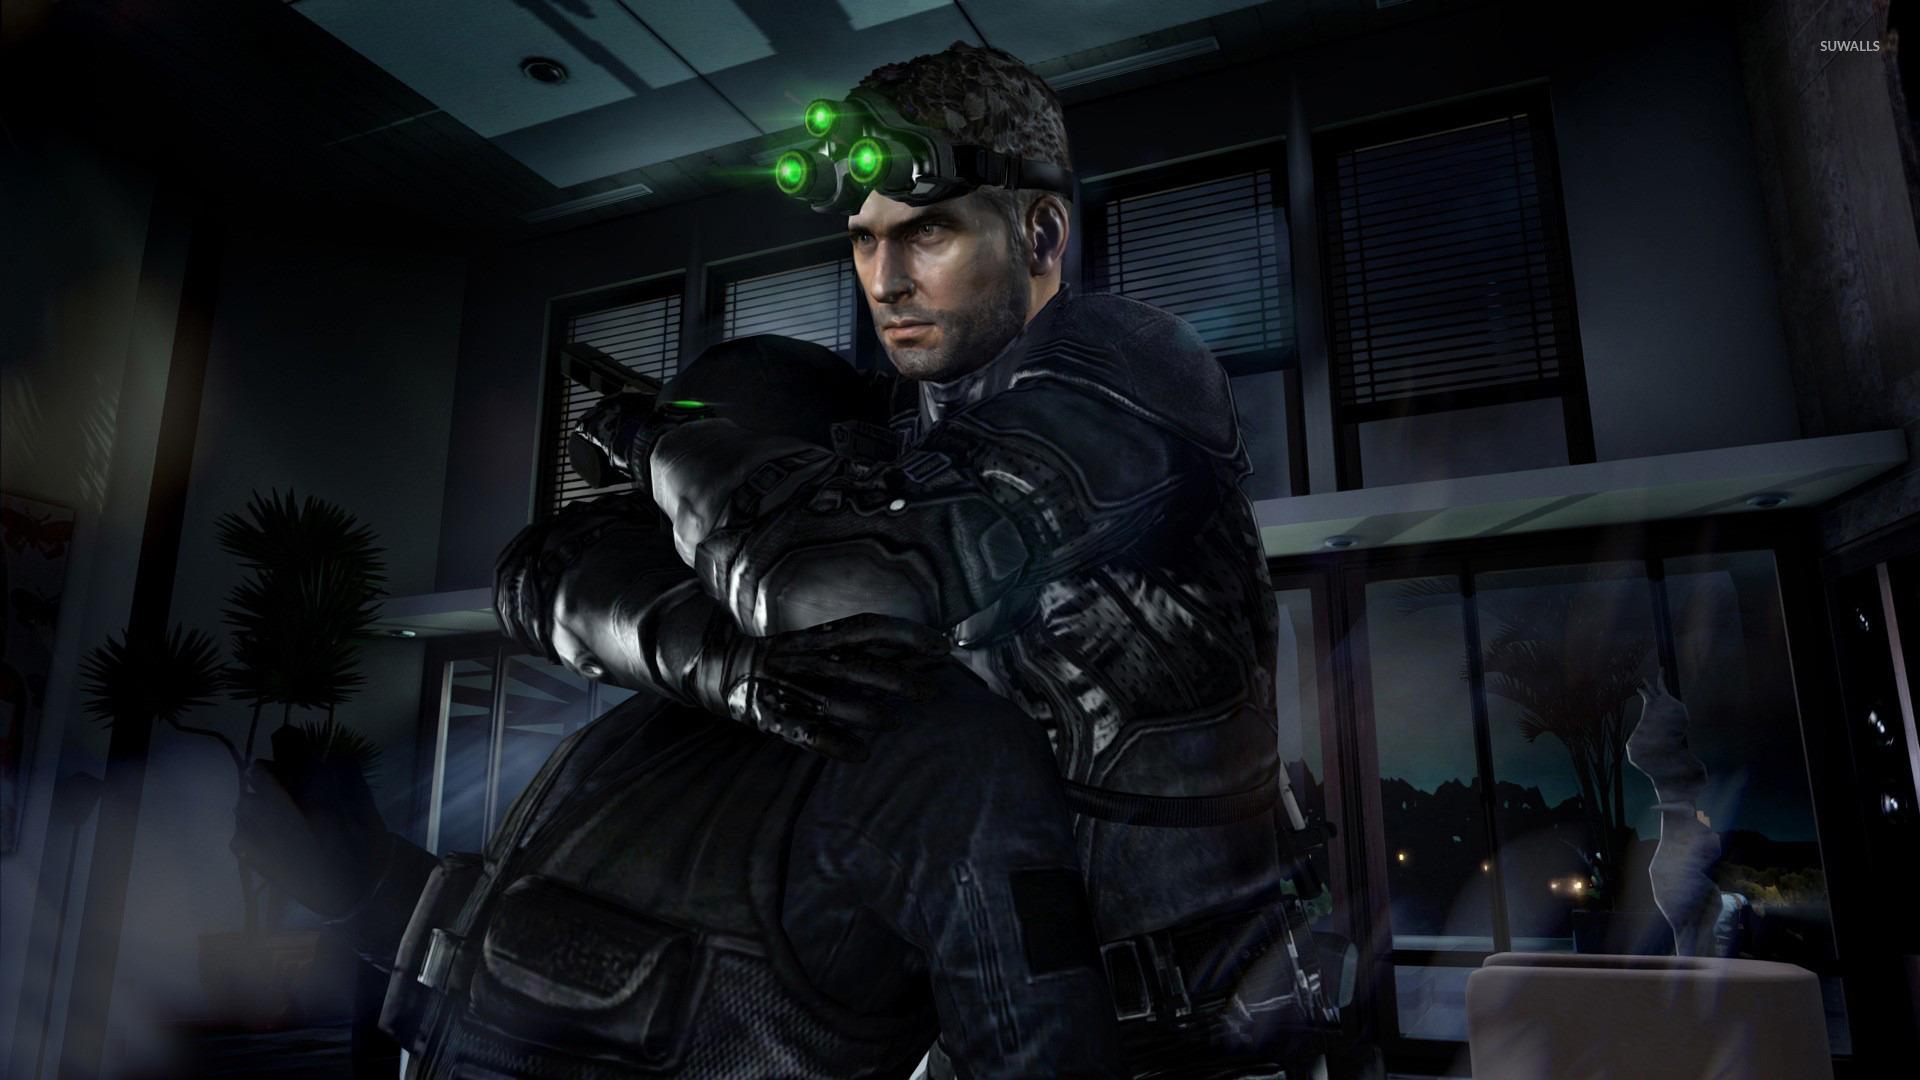 Tom Clancy S Splinter Cell Blacklist 2 Wallpaper Game